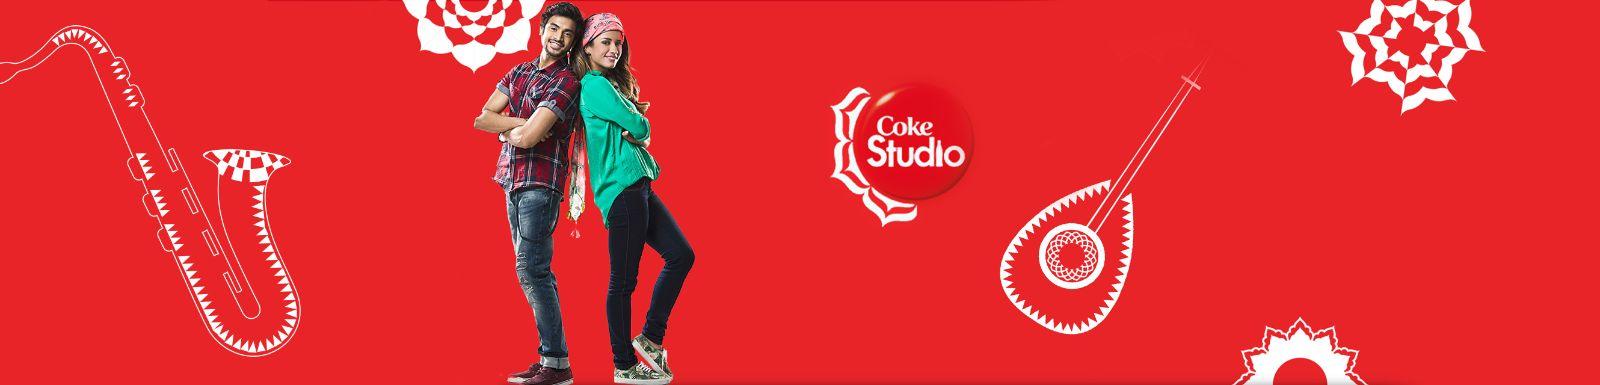 ������ ������ ������ Coke Studio ������ ������ ������ 3 ������� ����� 2014